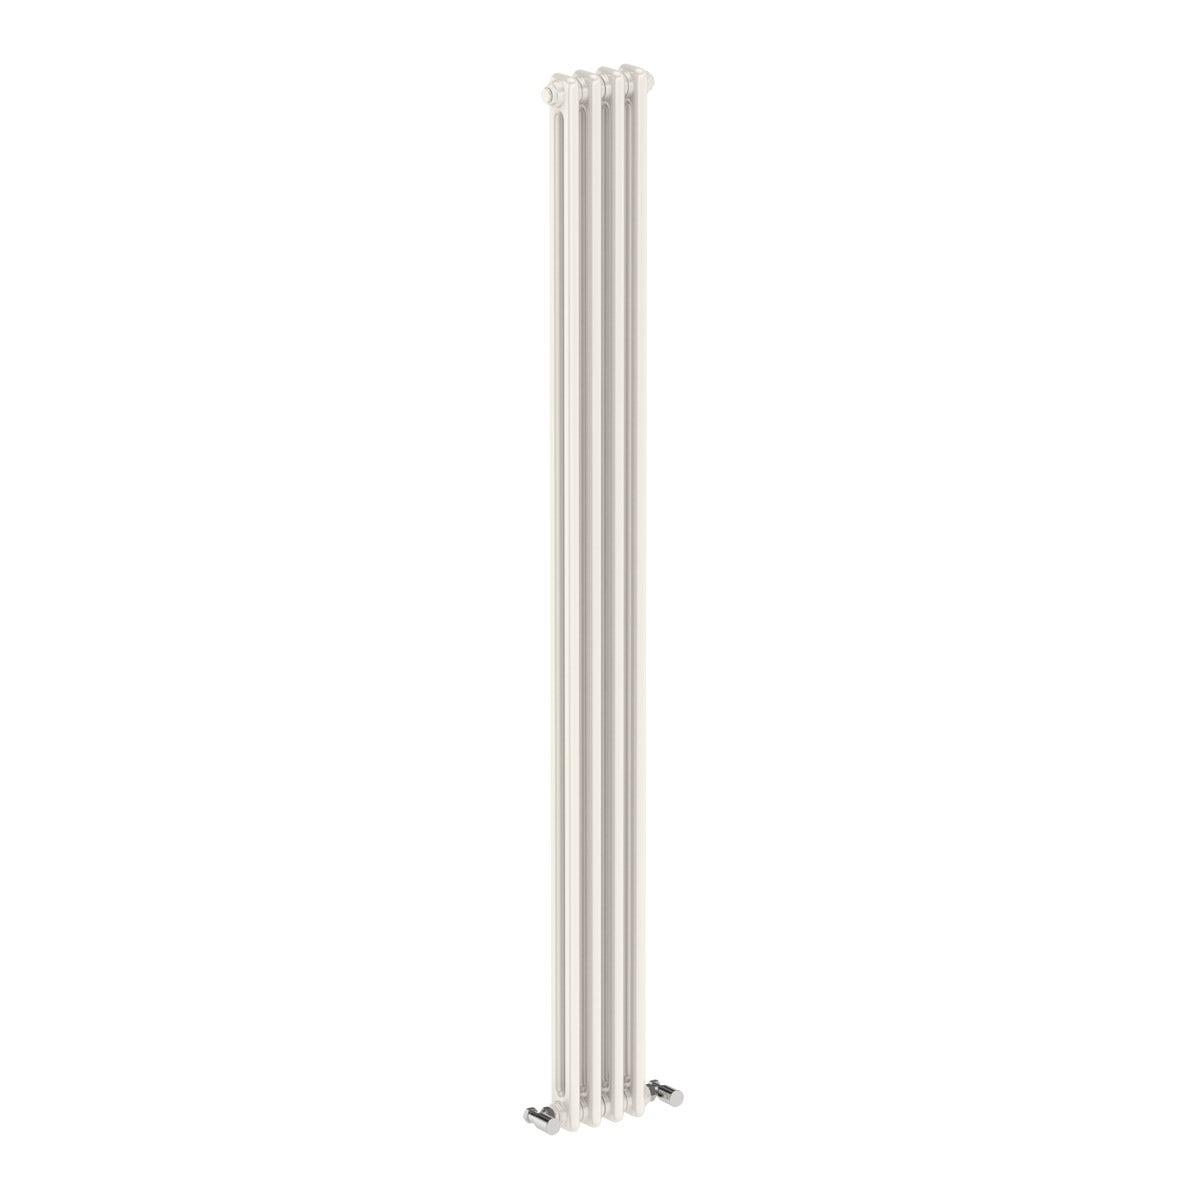 Dulwich vertical white double column radiator 1800 x 198